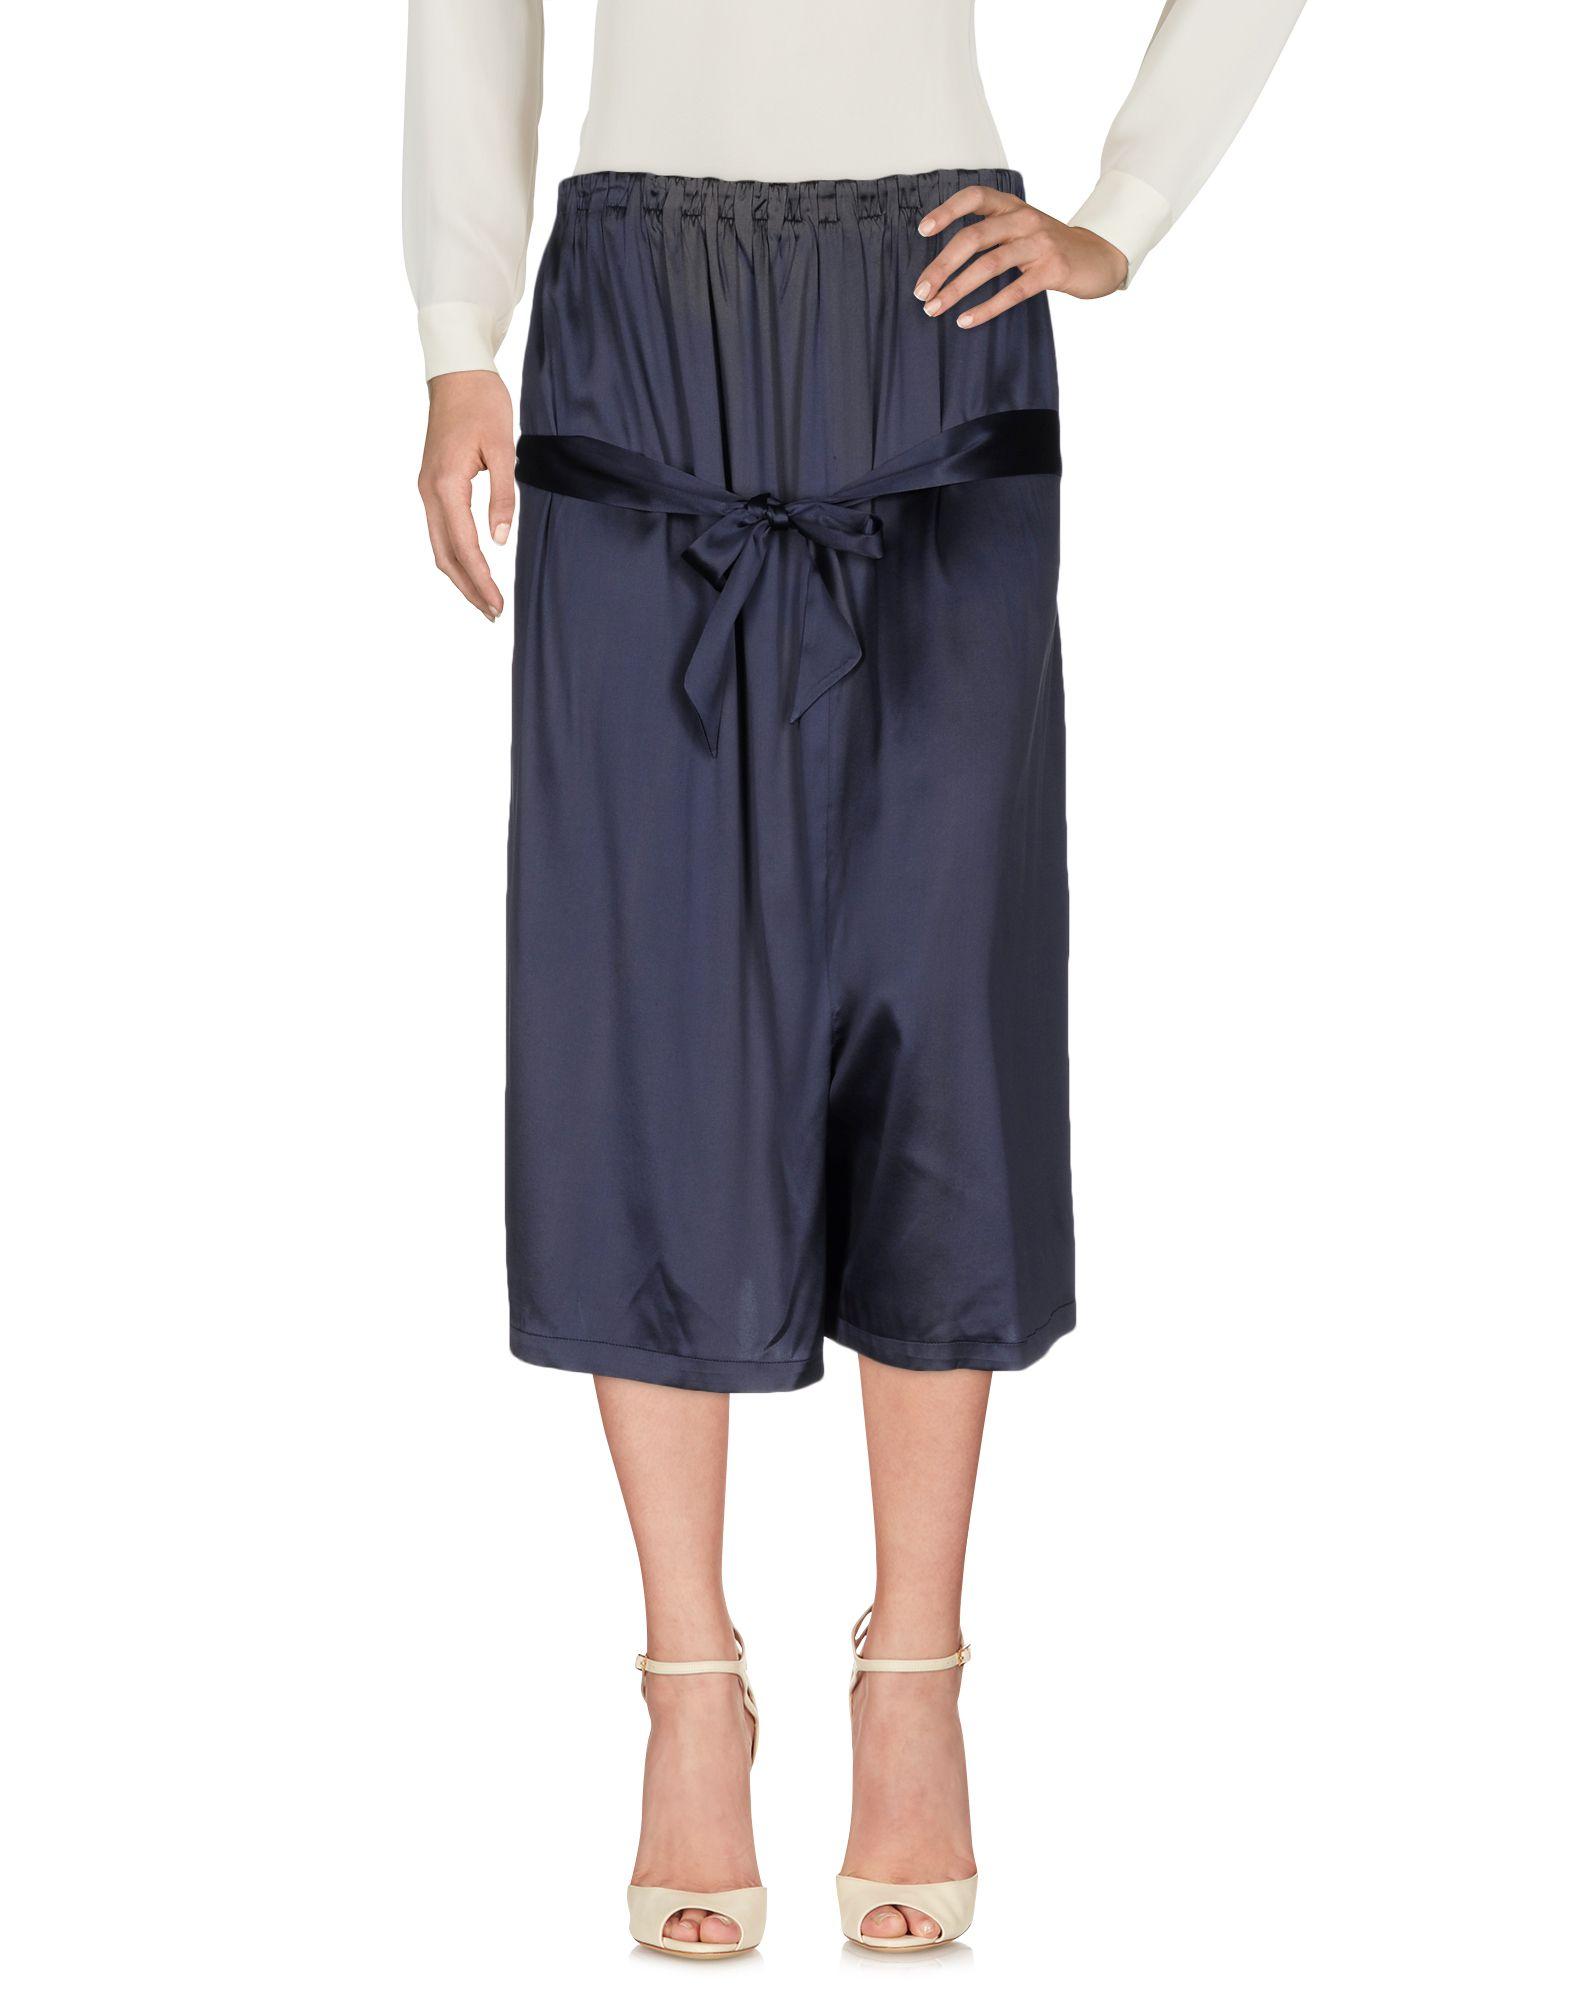 armani jeans ремень armani jeans 06115 r3 g8 ARMANI JEANS Юбка длиной 3/4